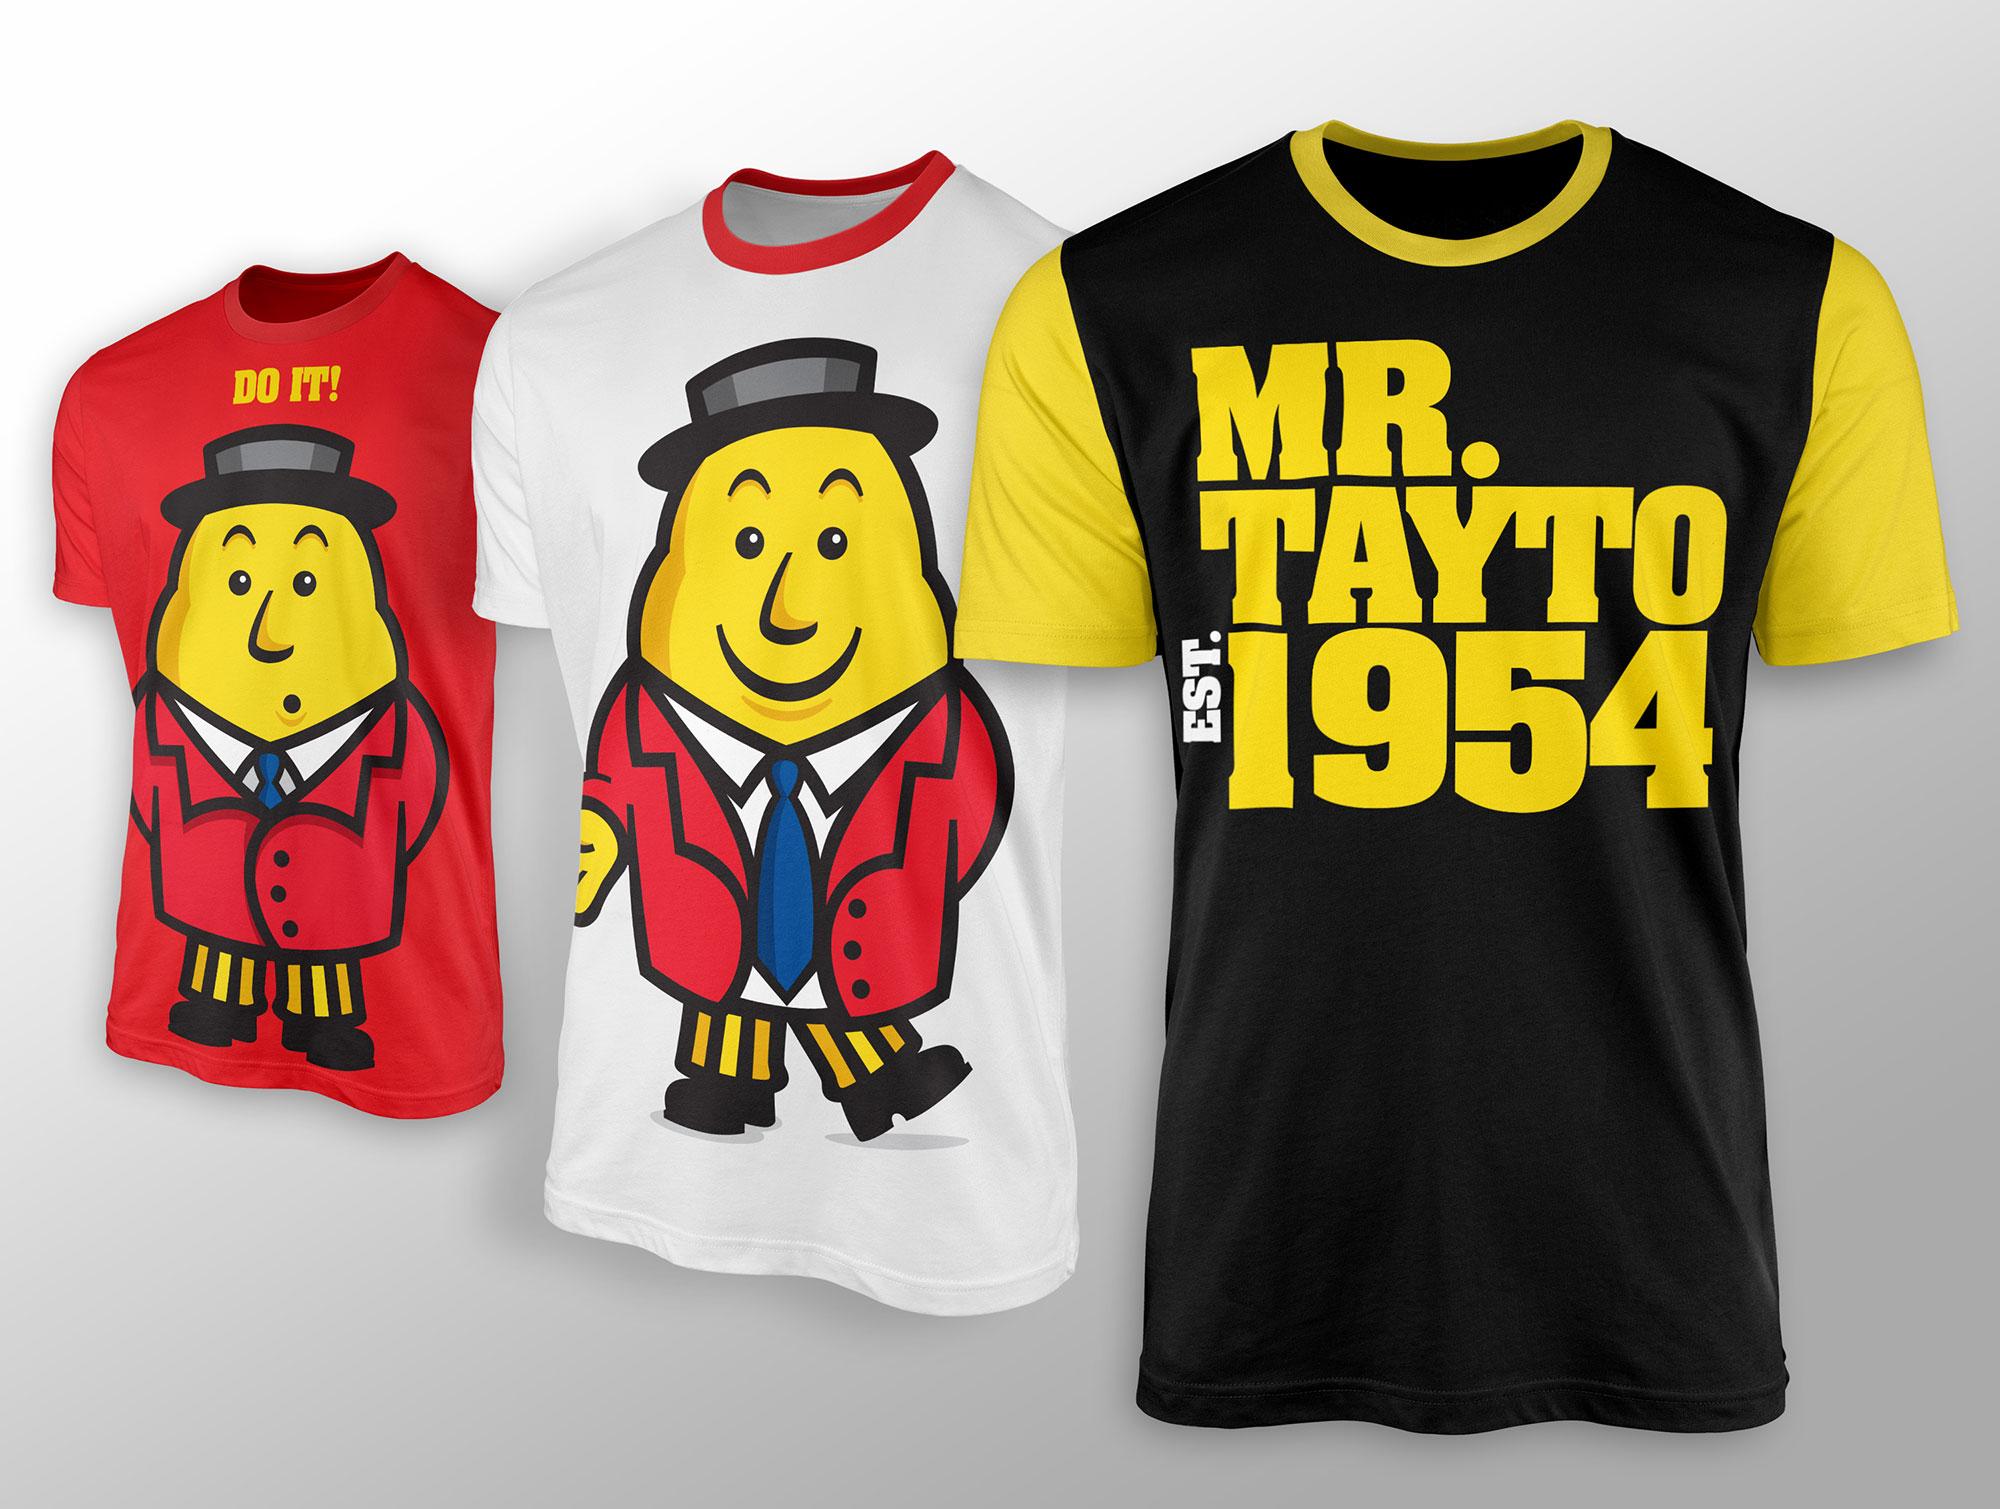 Mr. Tayto t shirts merchandise graphic design freelance Dublin